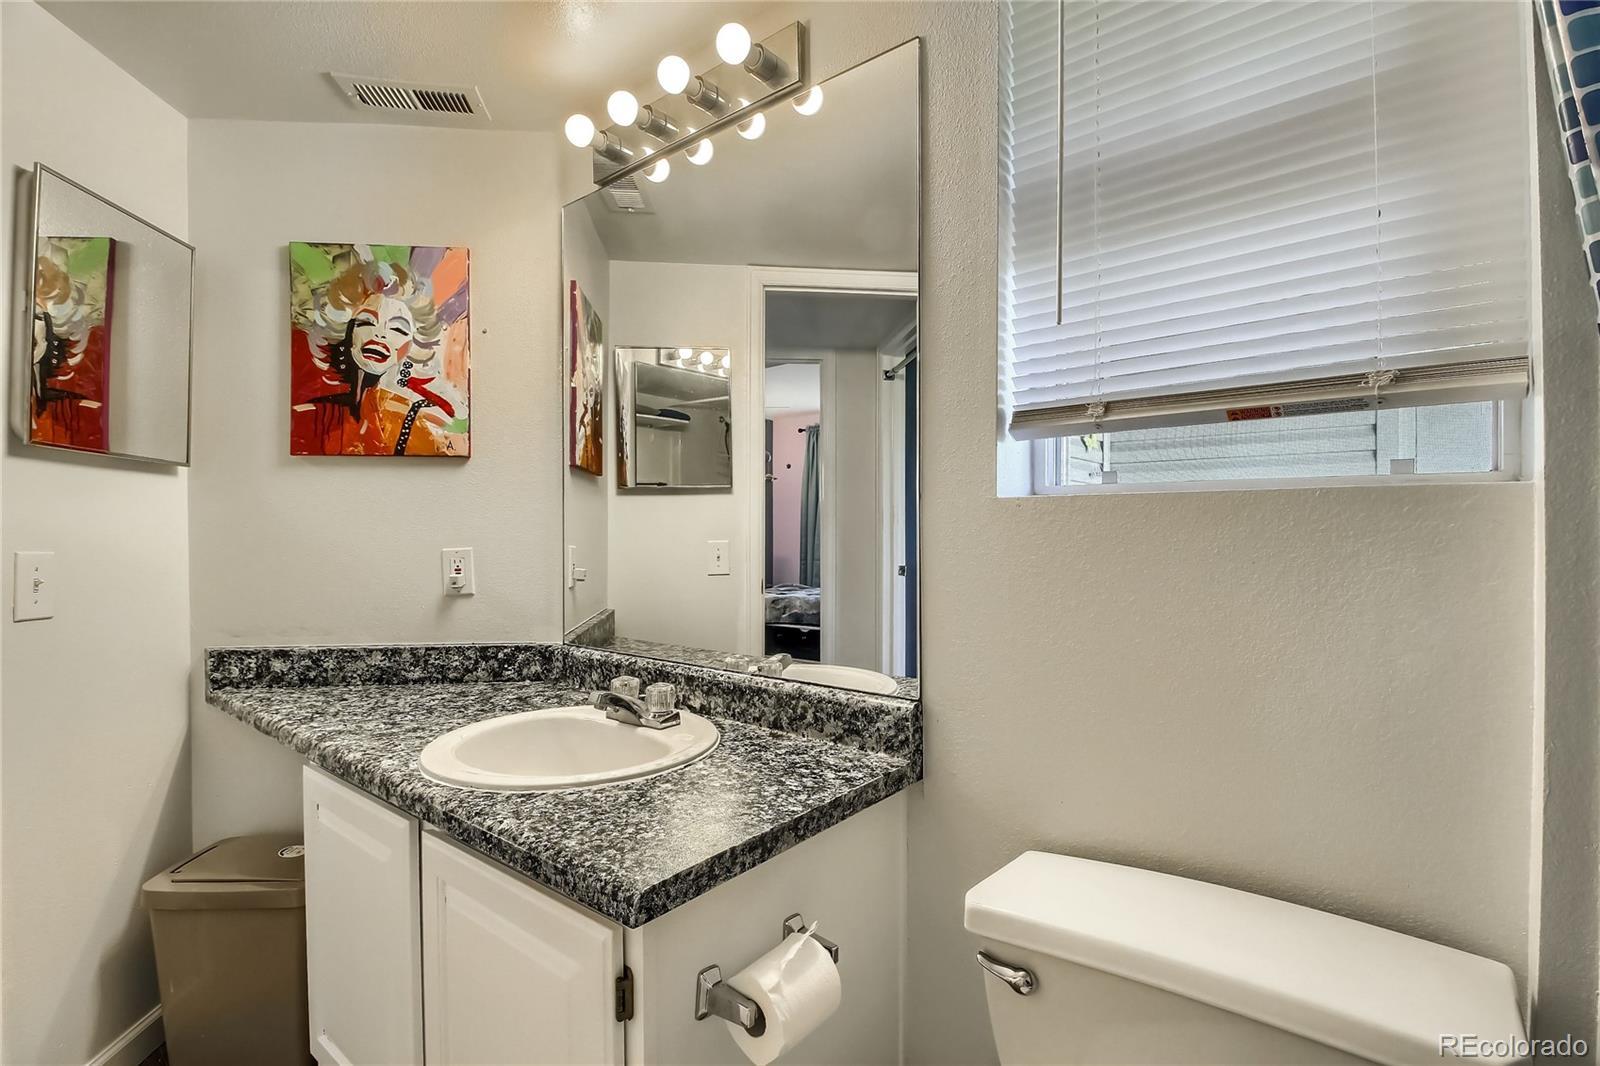 MLS# 8175765 - 23 - 12338 W Dorado Place #201, Littleton, CO 80127